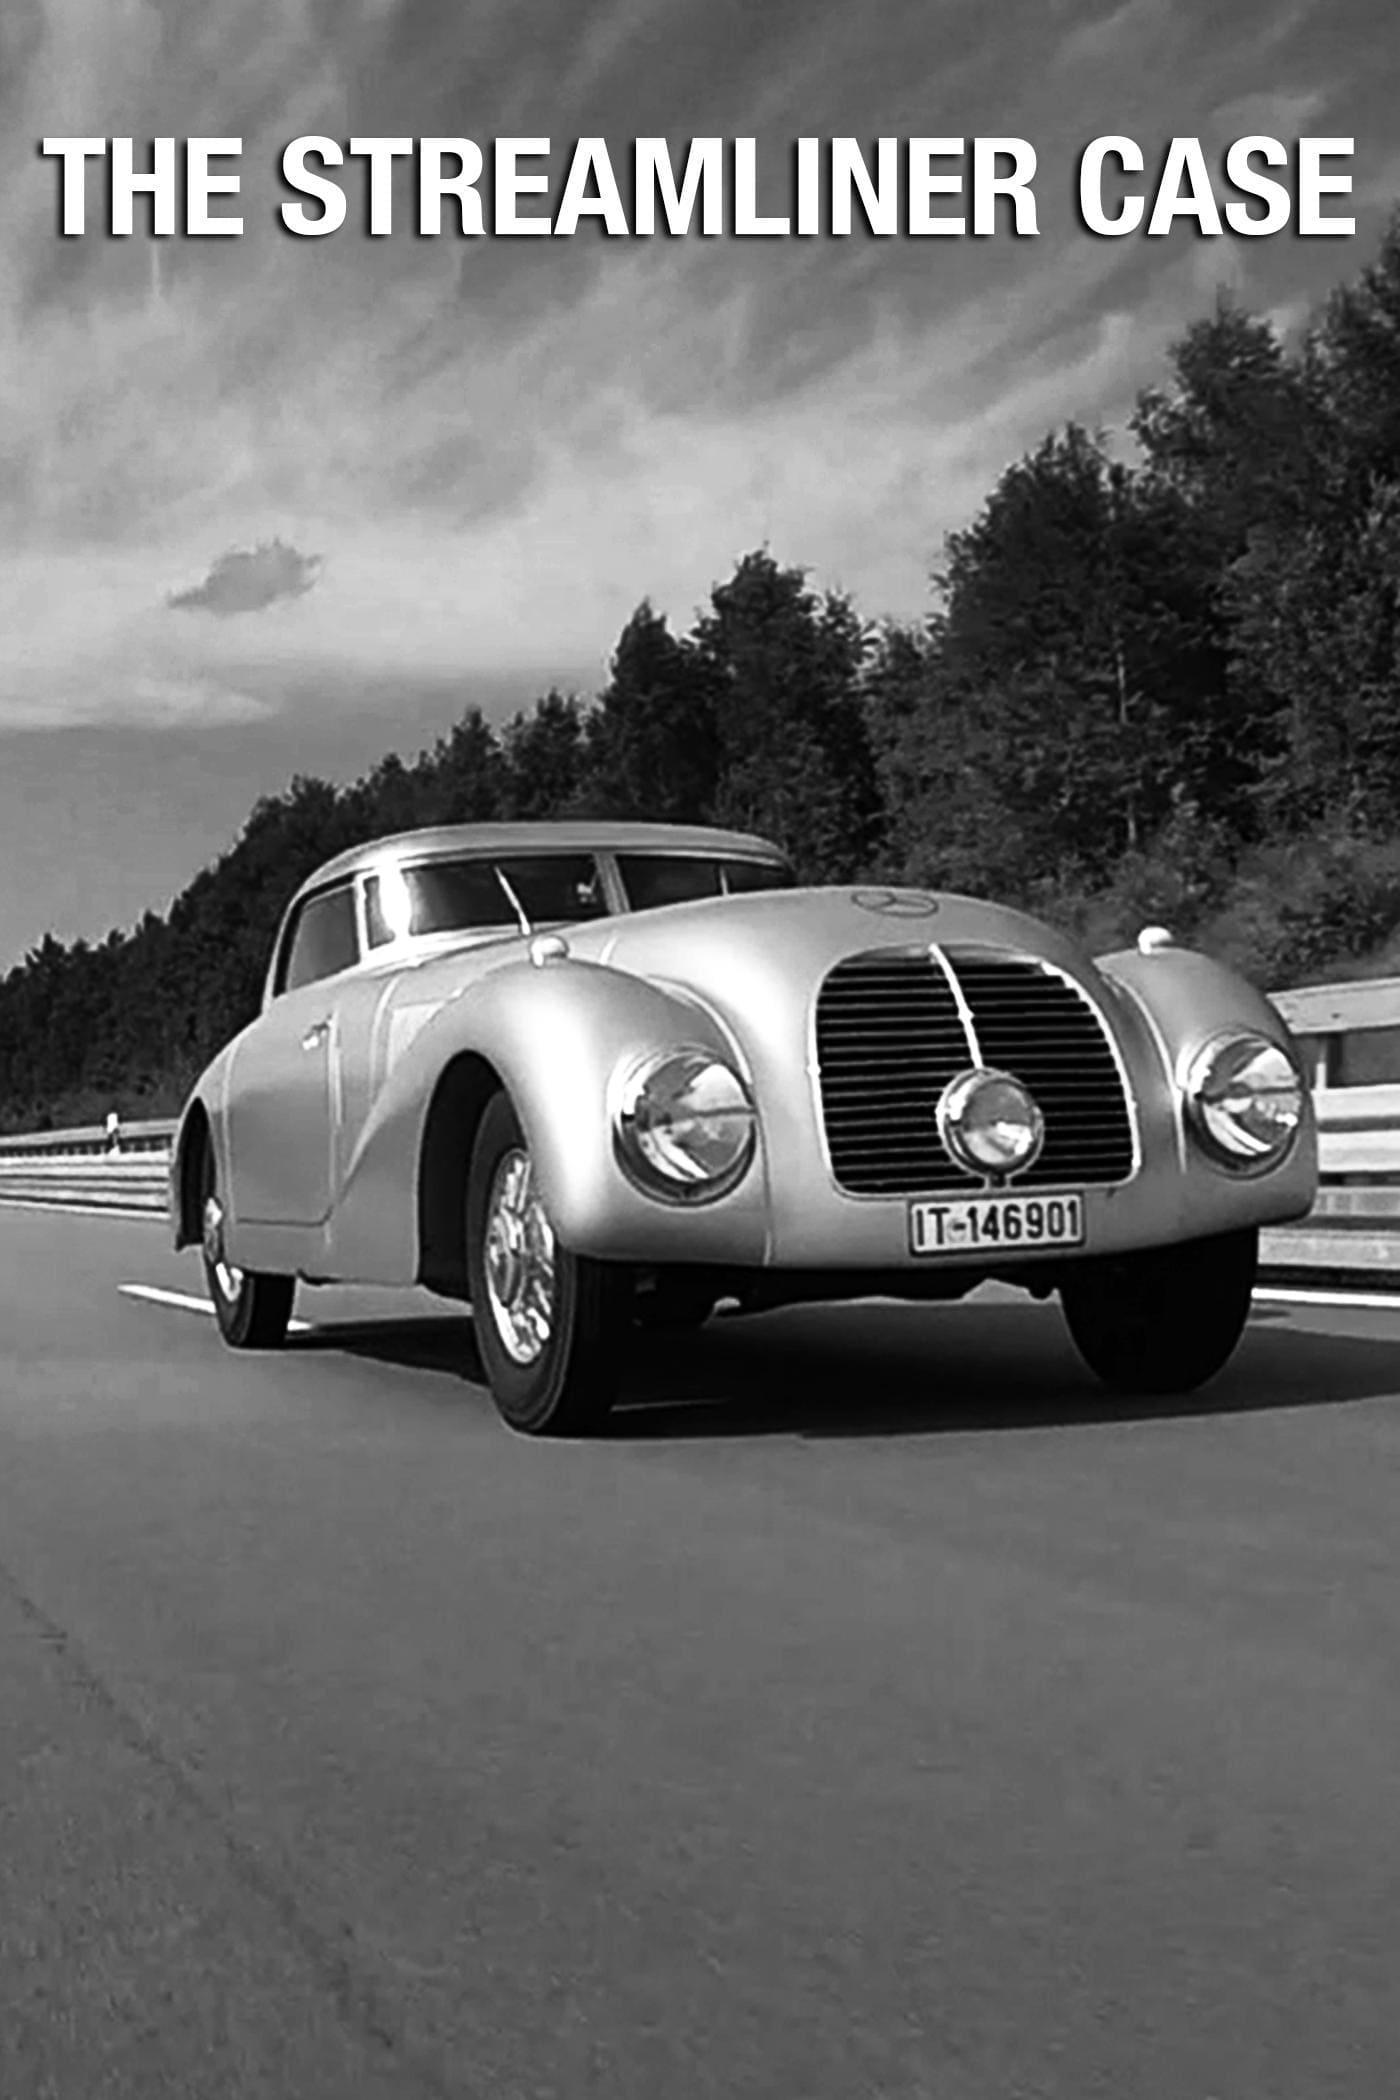 The Streamliner Case - Recreating The Mercedes-Benz 540K